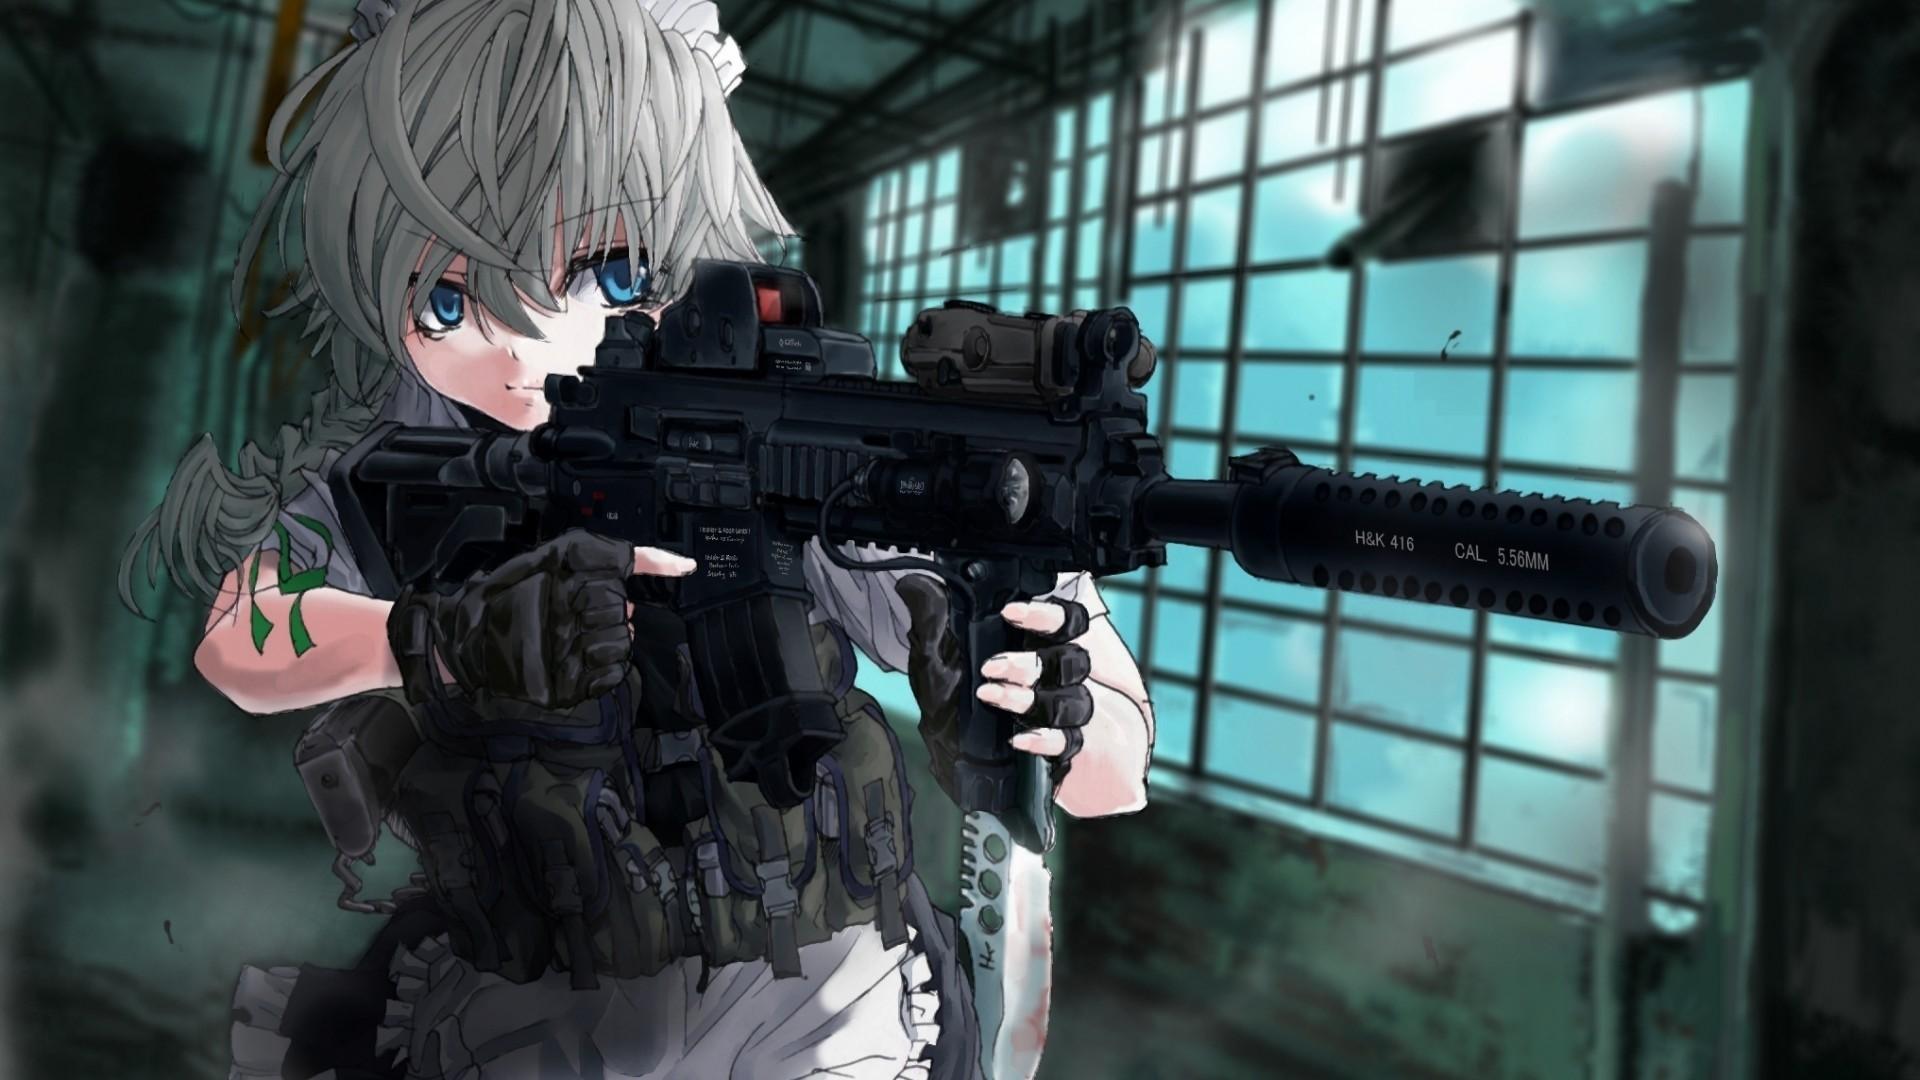 Anime Girls With Guns Wallpaper 1920x1080